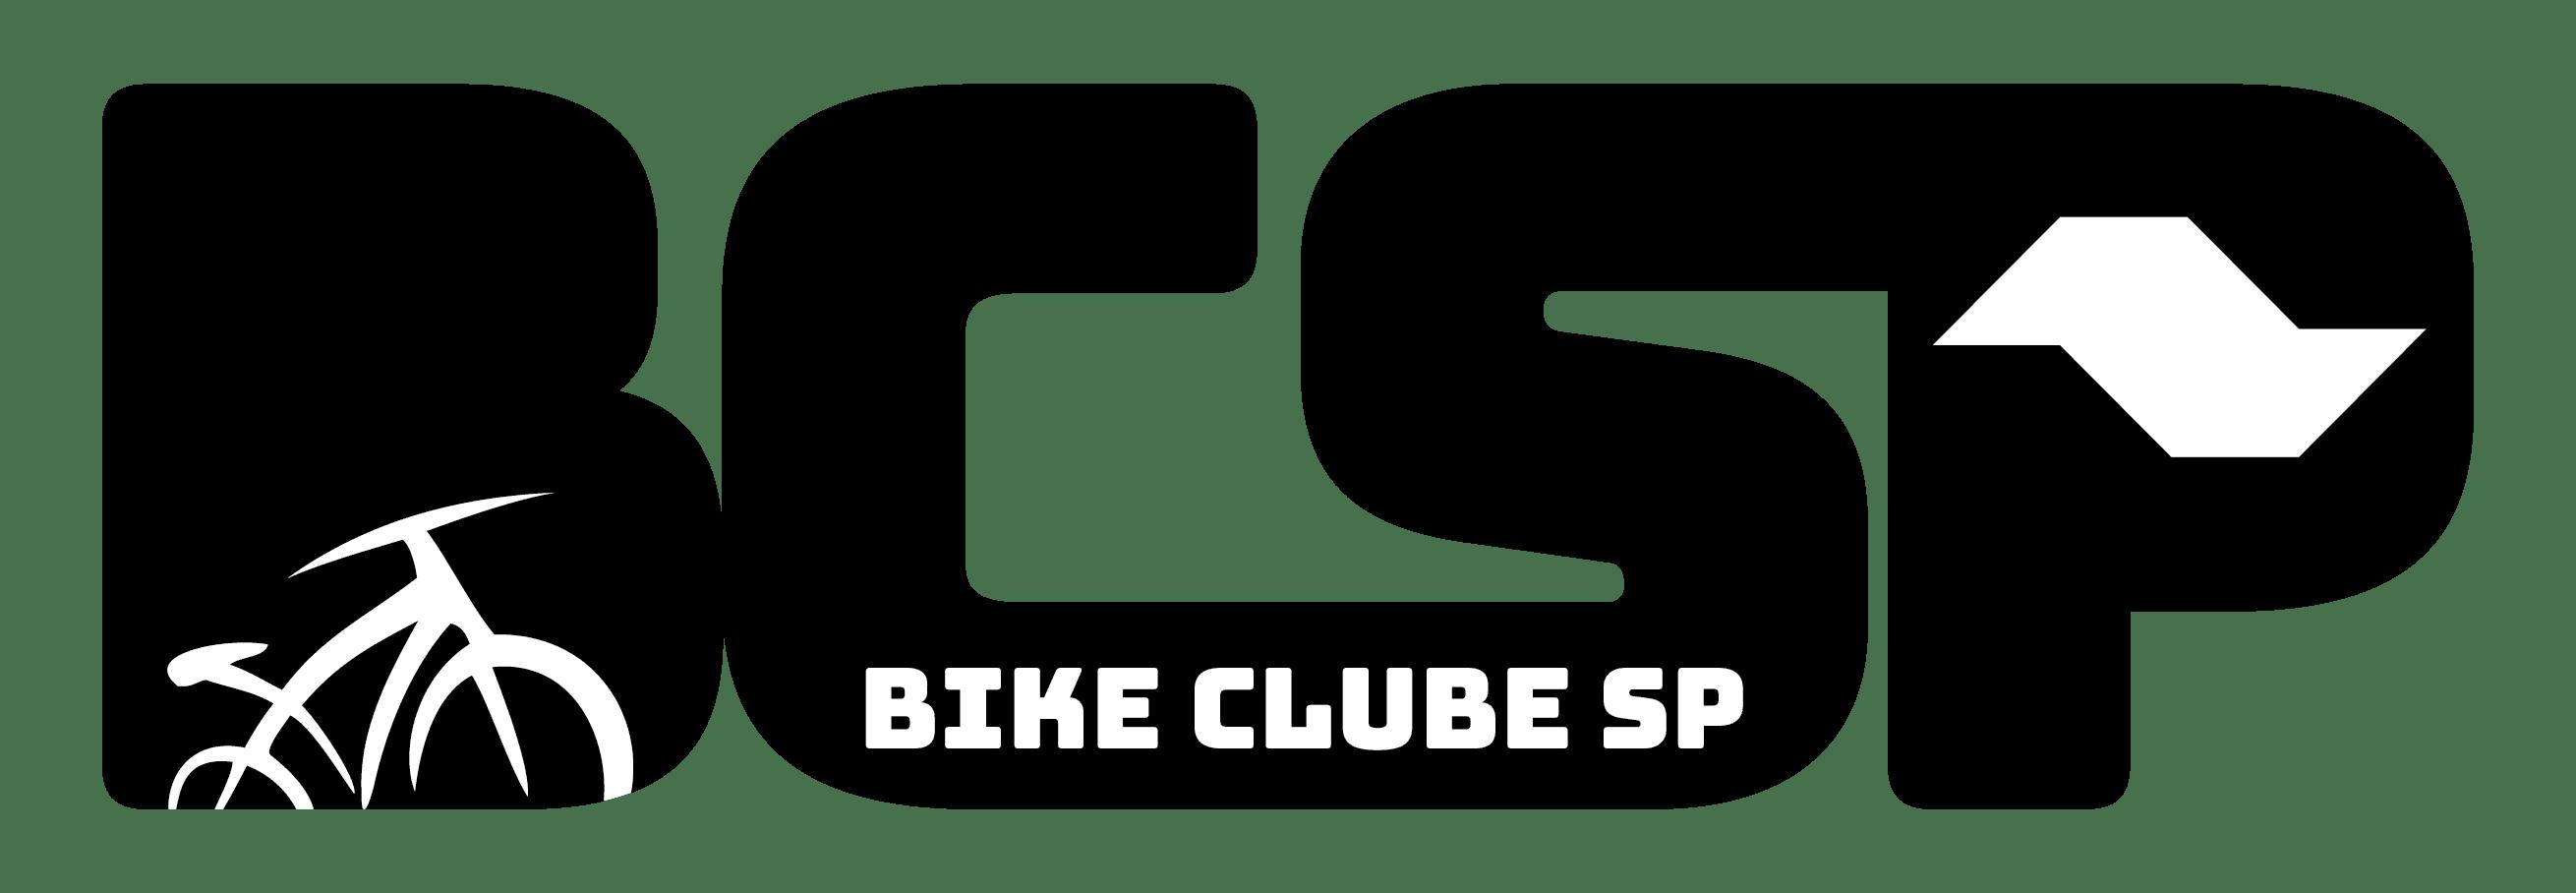 Idnetidade visual Boke Clube SP - Qpix Creative Minds